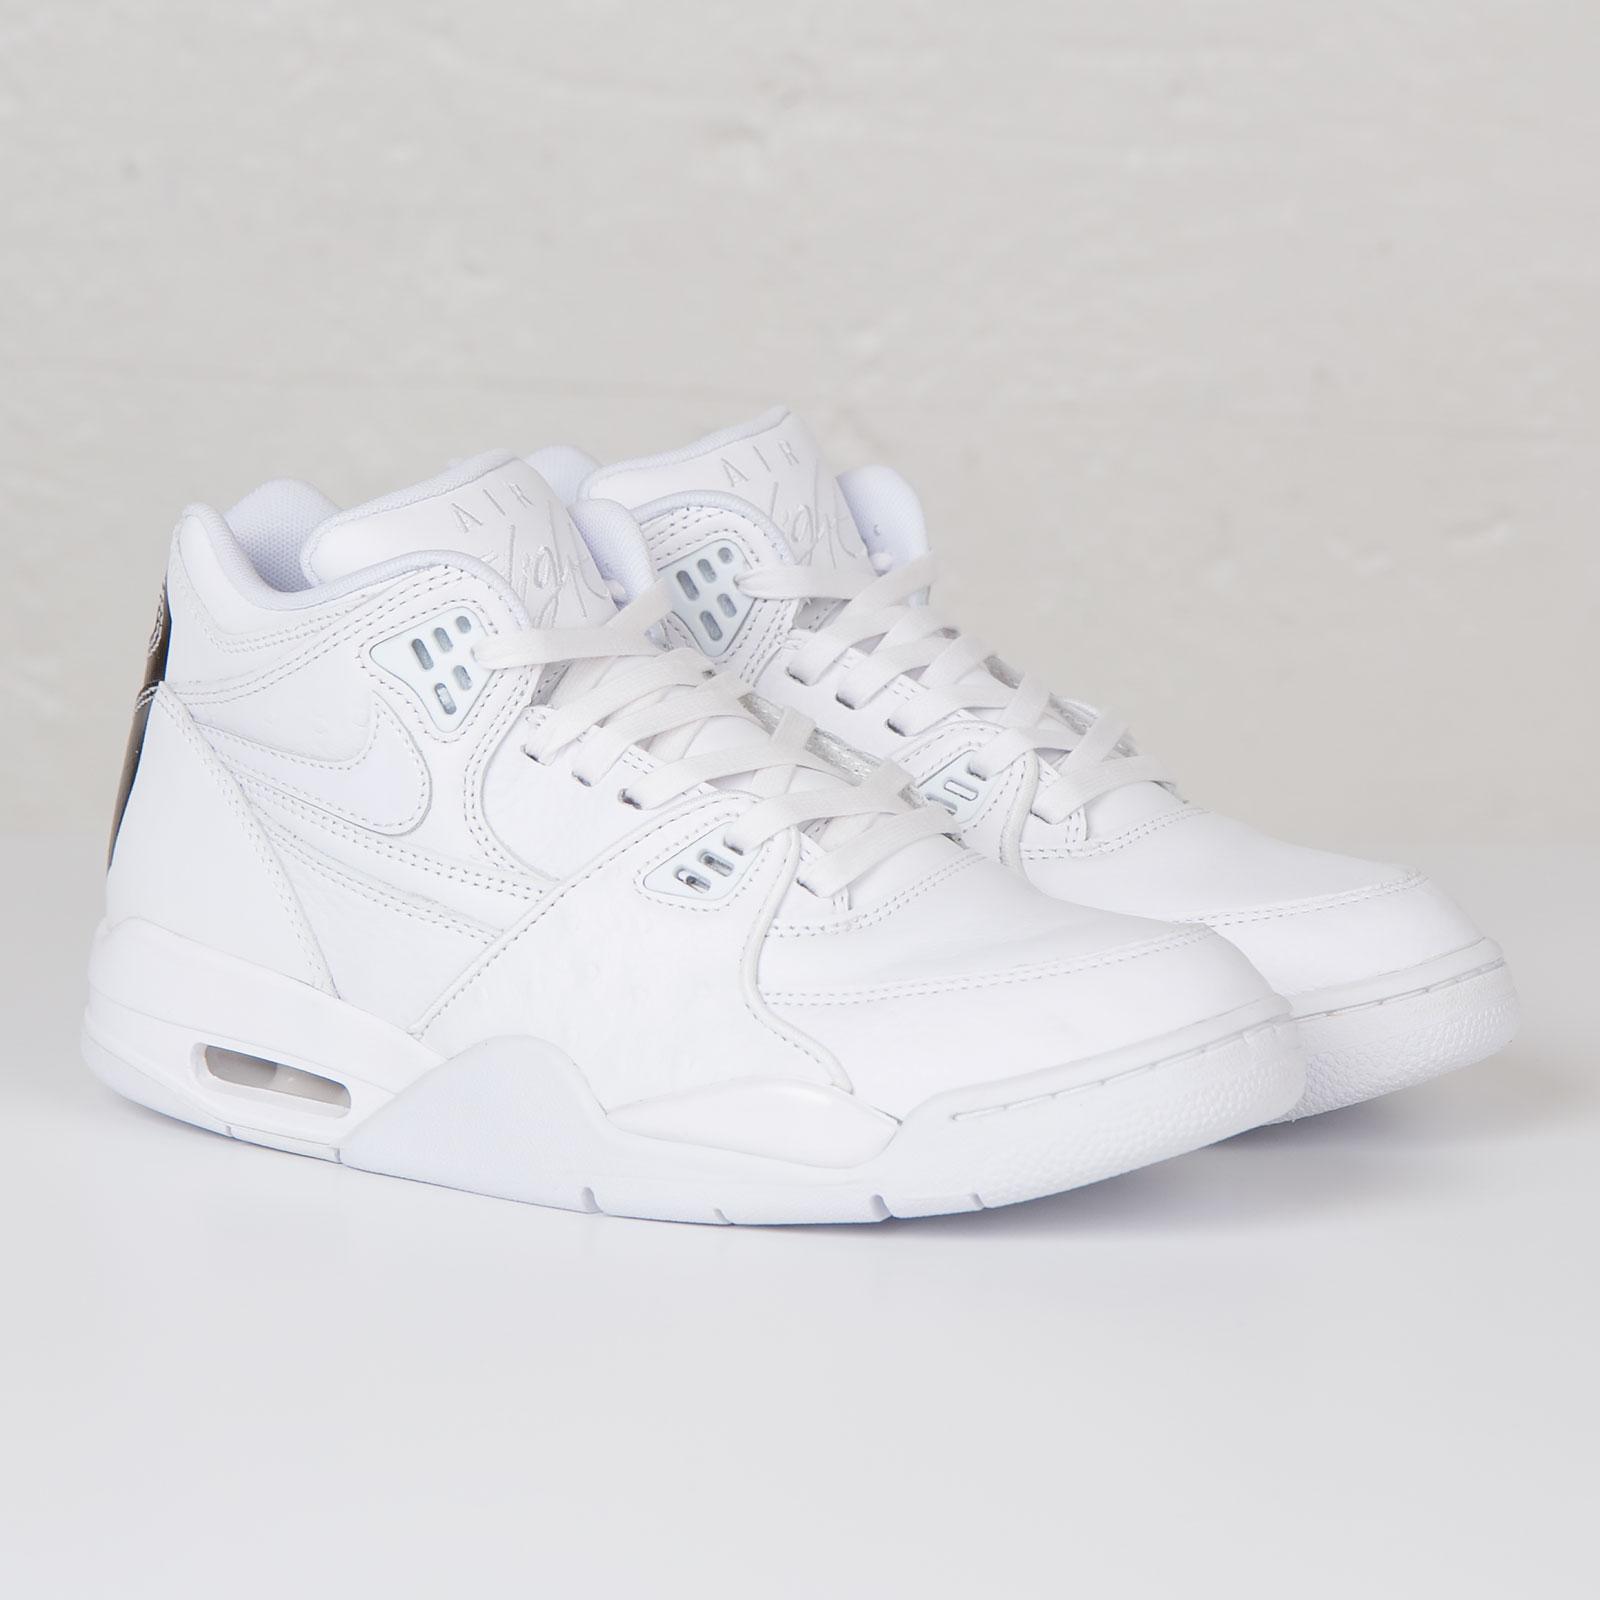 online retailer e1ddc 90af0 Nike Air Flight 89 LE QS